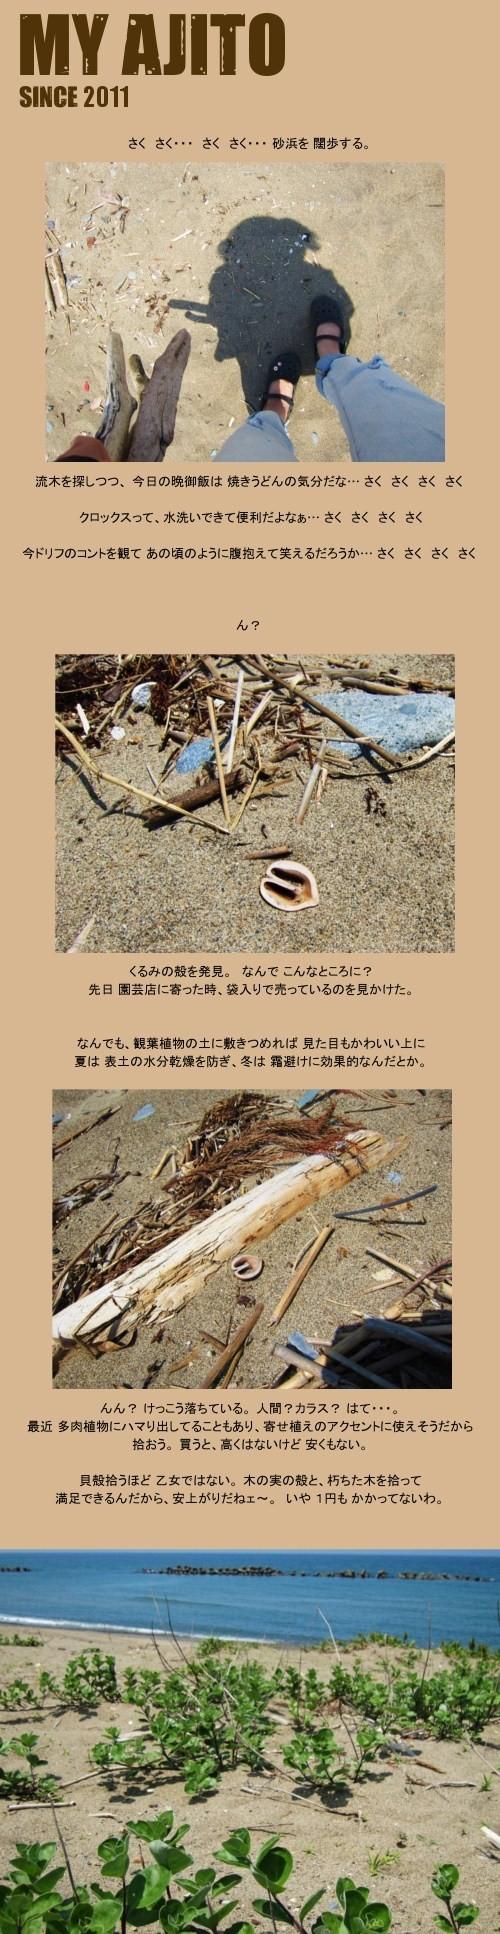 ryubo_3.jpg